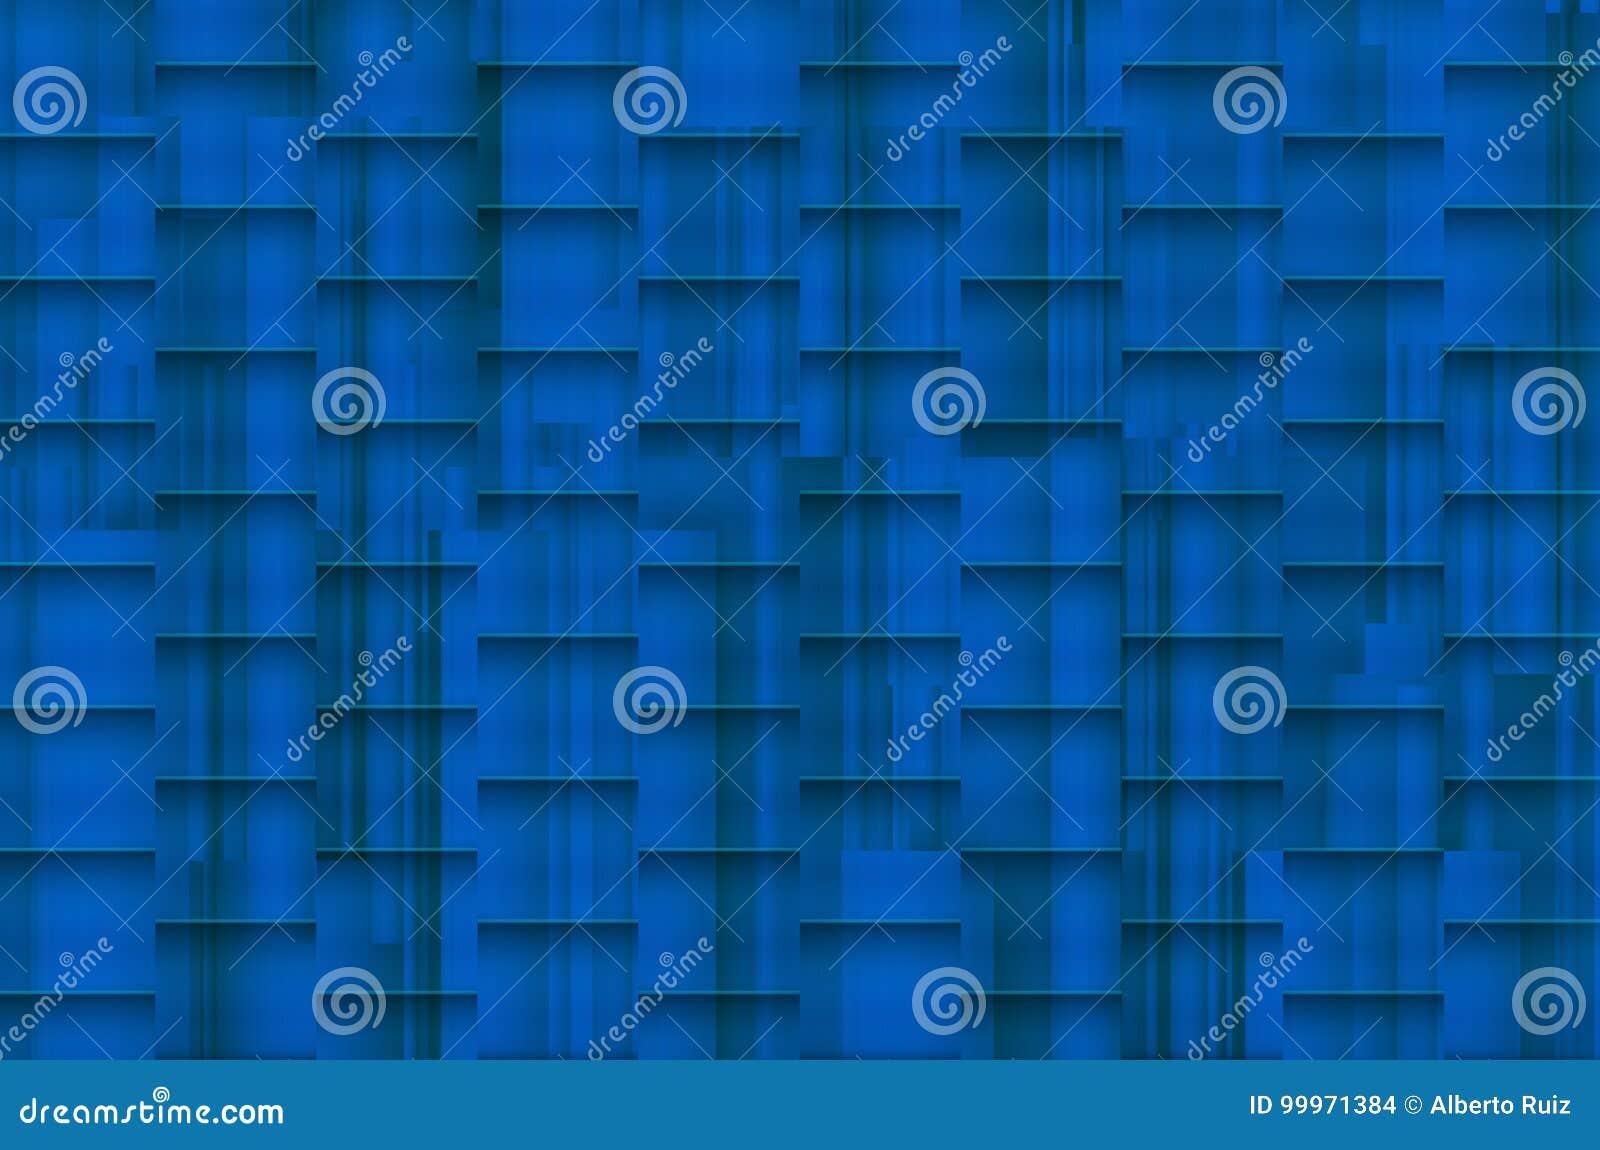 Fuzzy bluish background with architectonic shadows